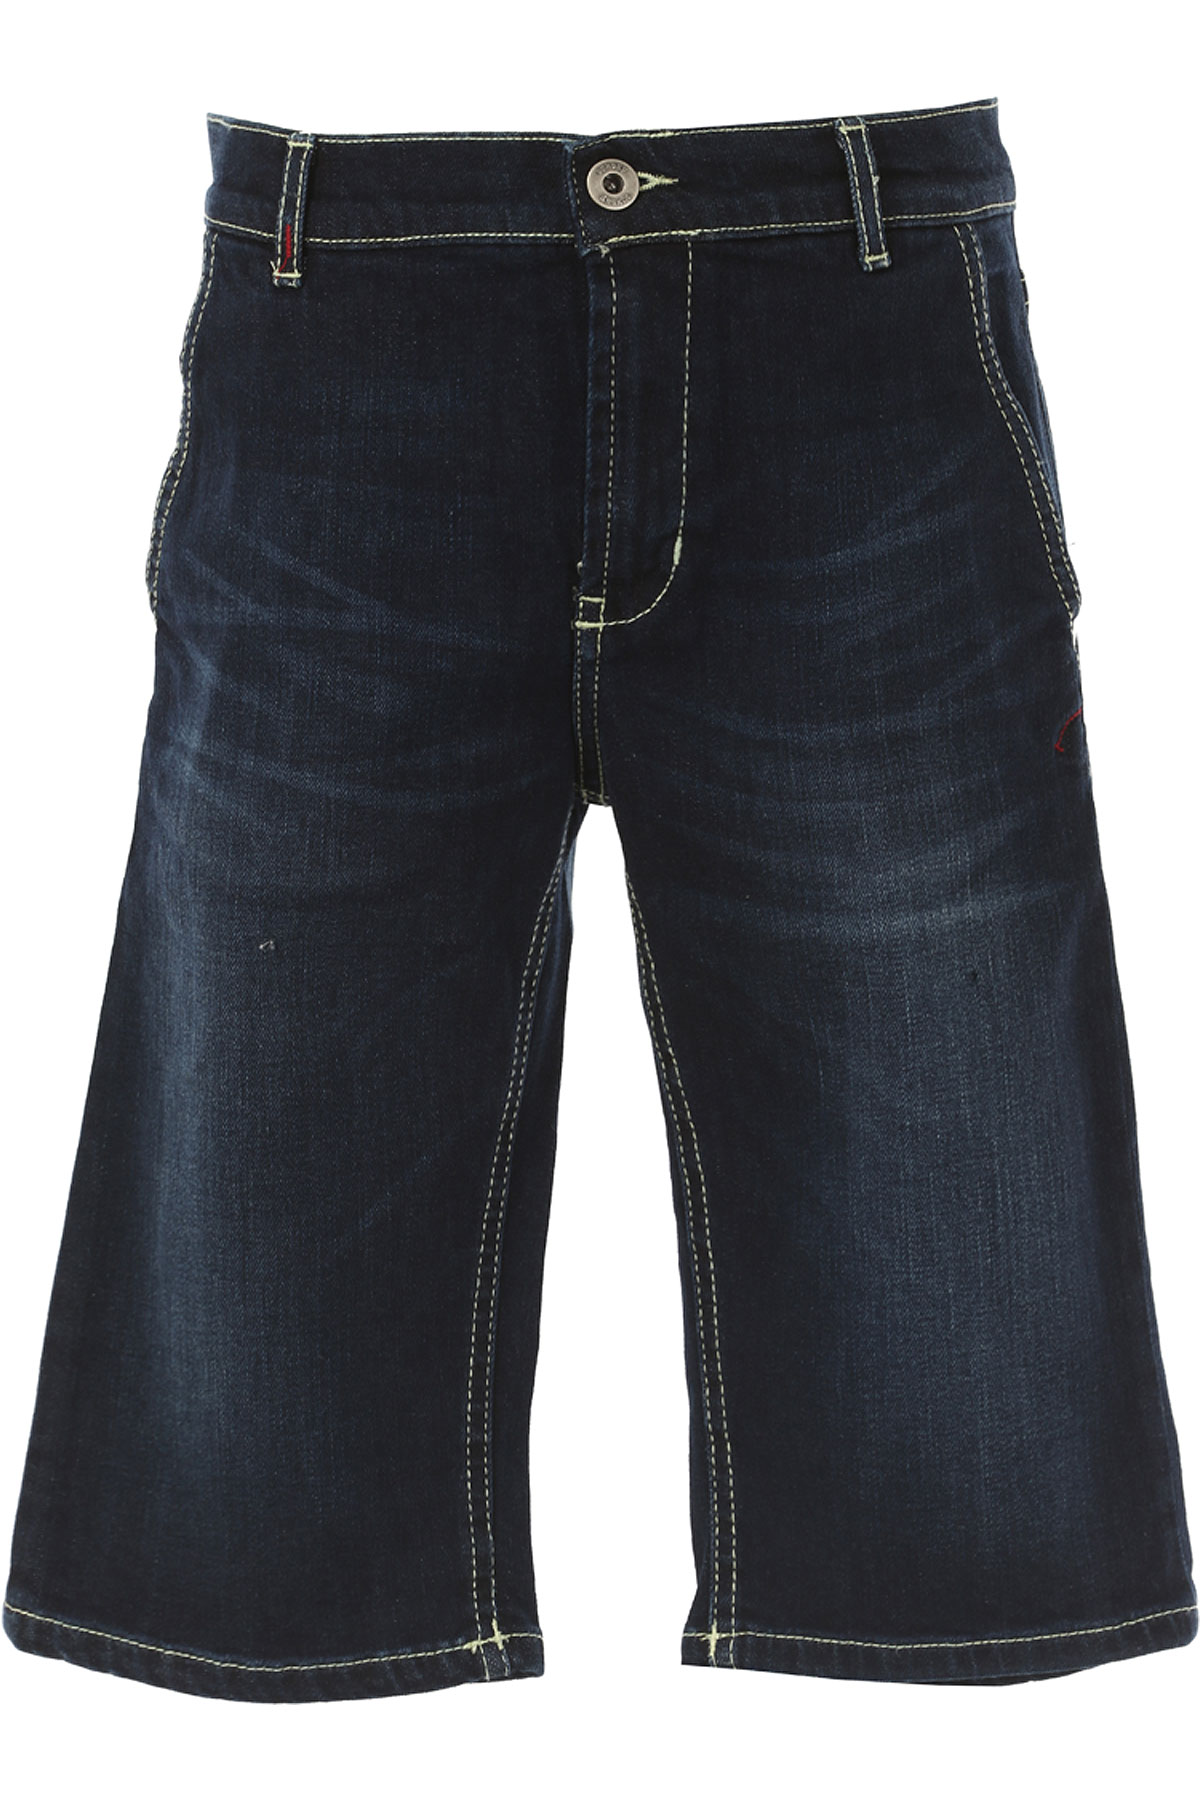 Image of Dondup Kids Shorts for Boys On Sale in Outlet, Bleu Denim, Cotton, 2017, 10Y 4Y